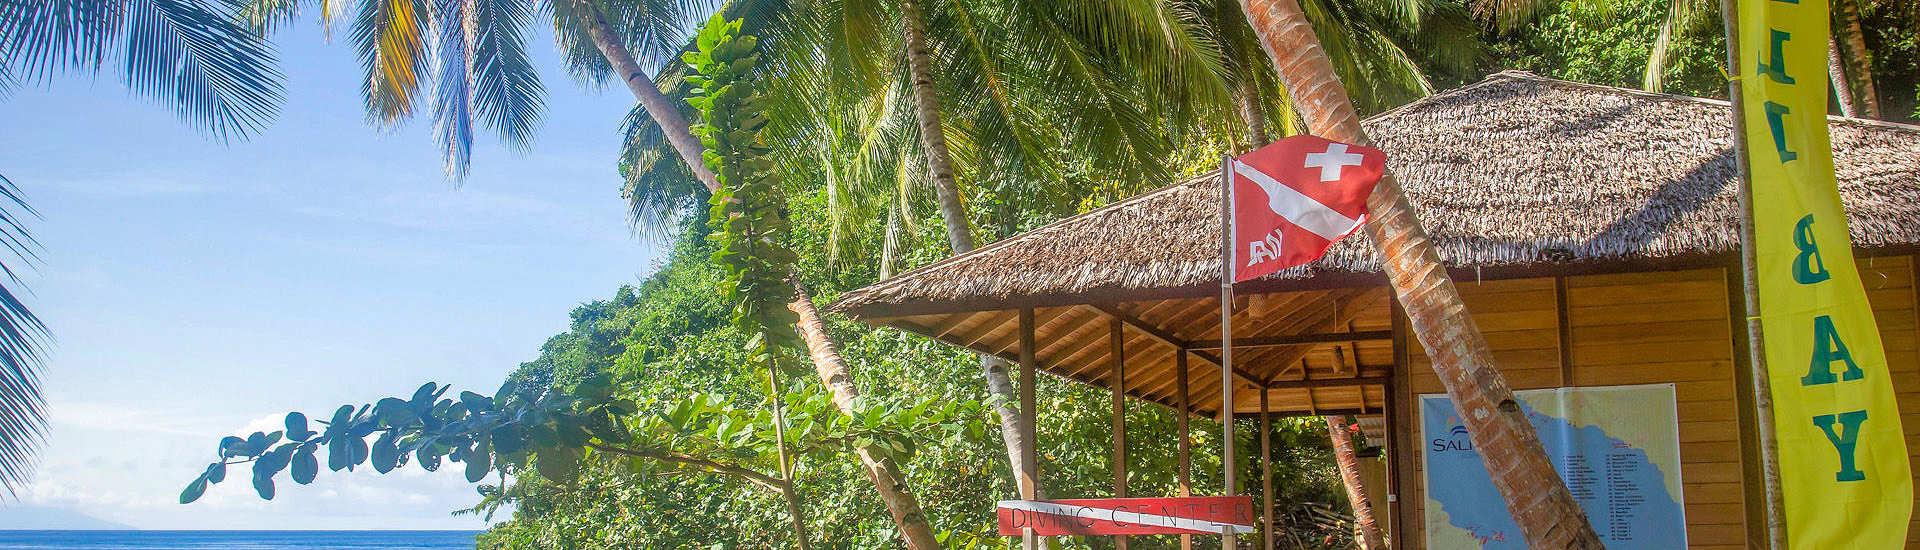 Sali Bay Resort Divecenter – Nord-Molukken, Indonesien